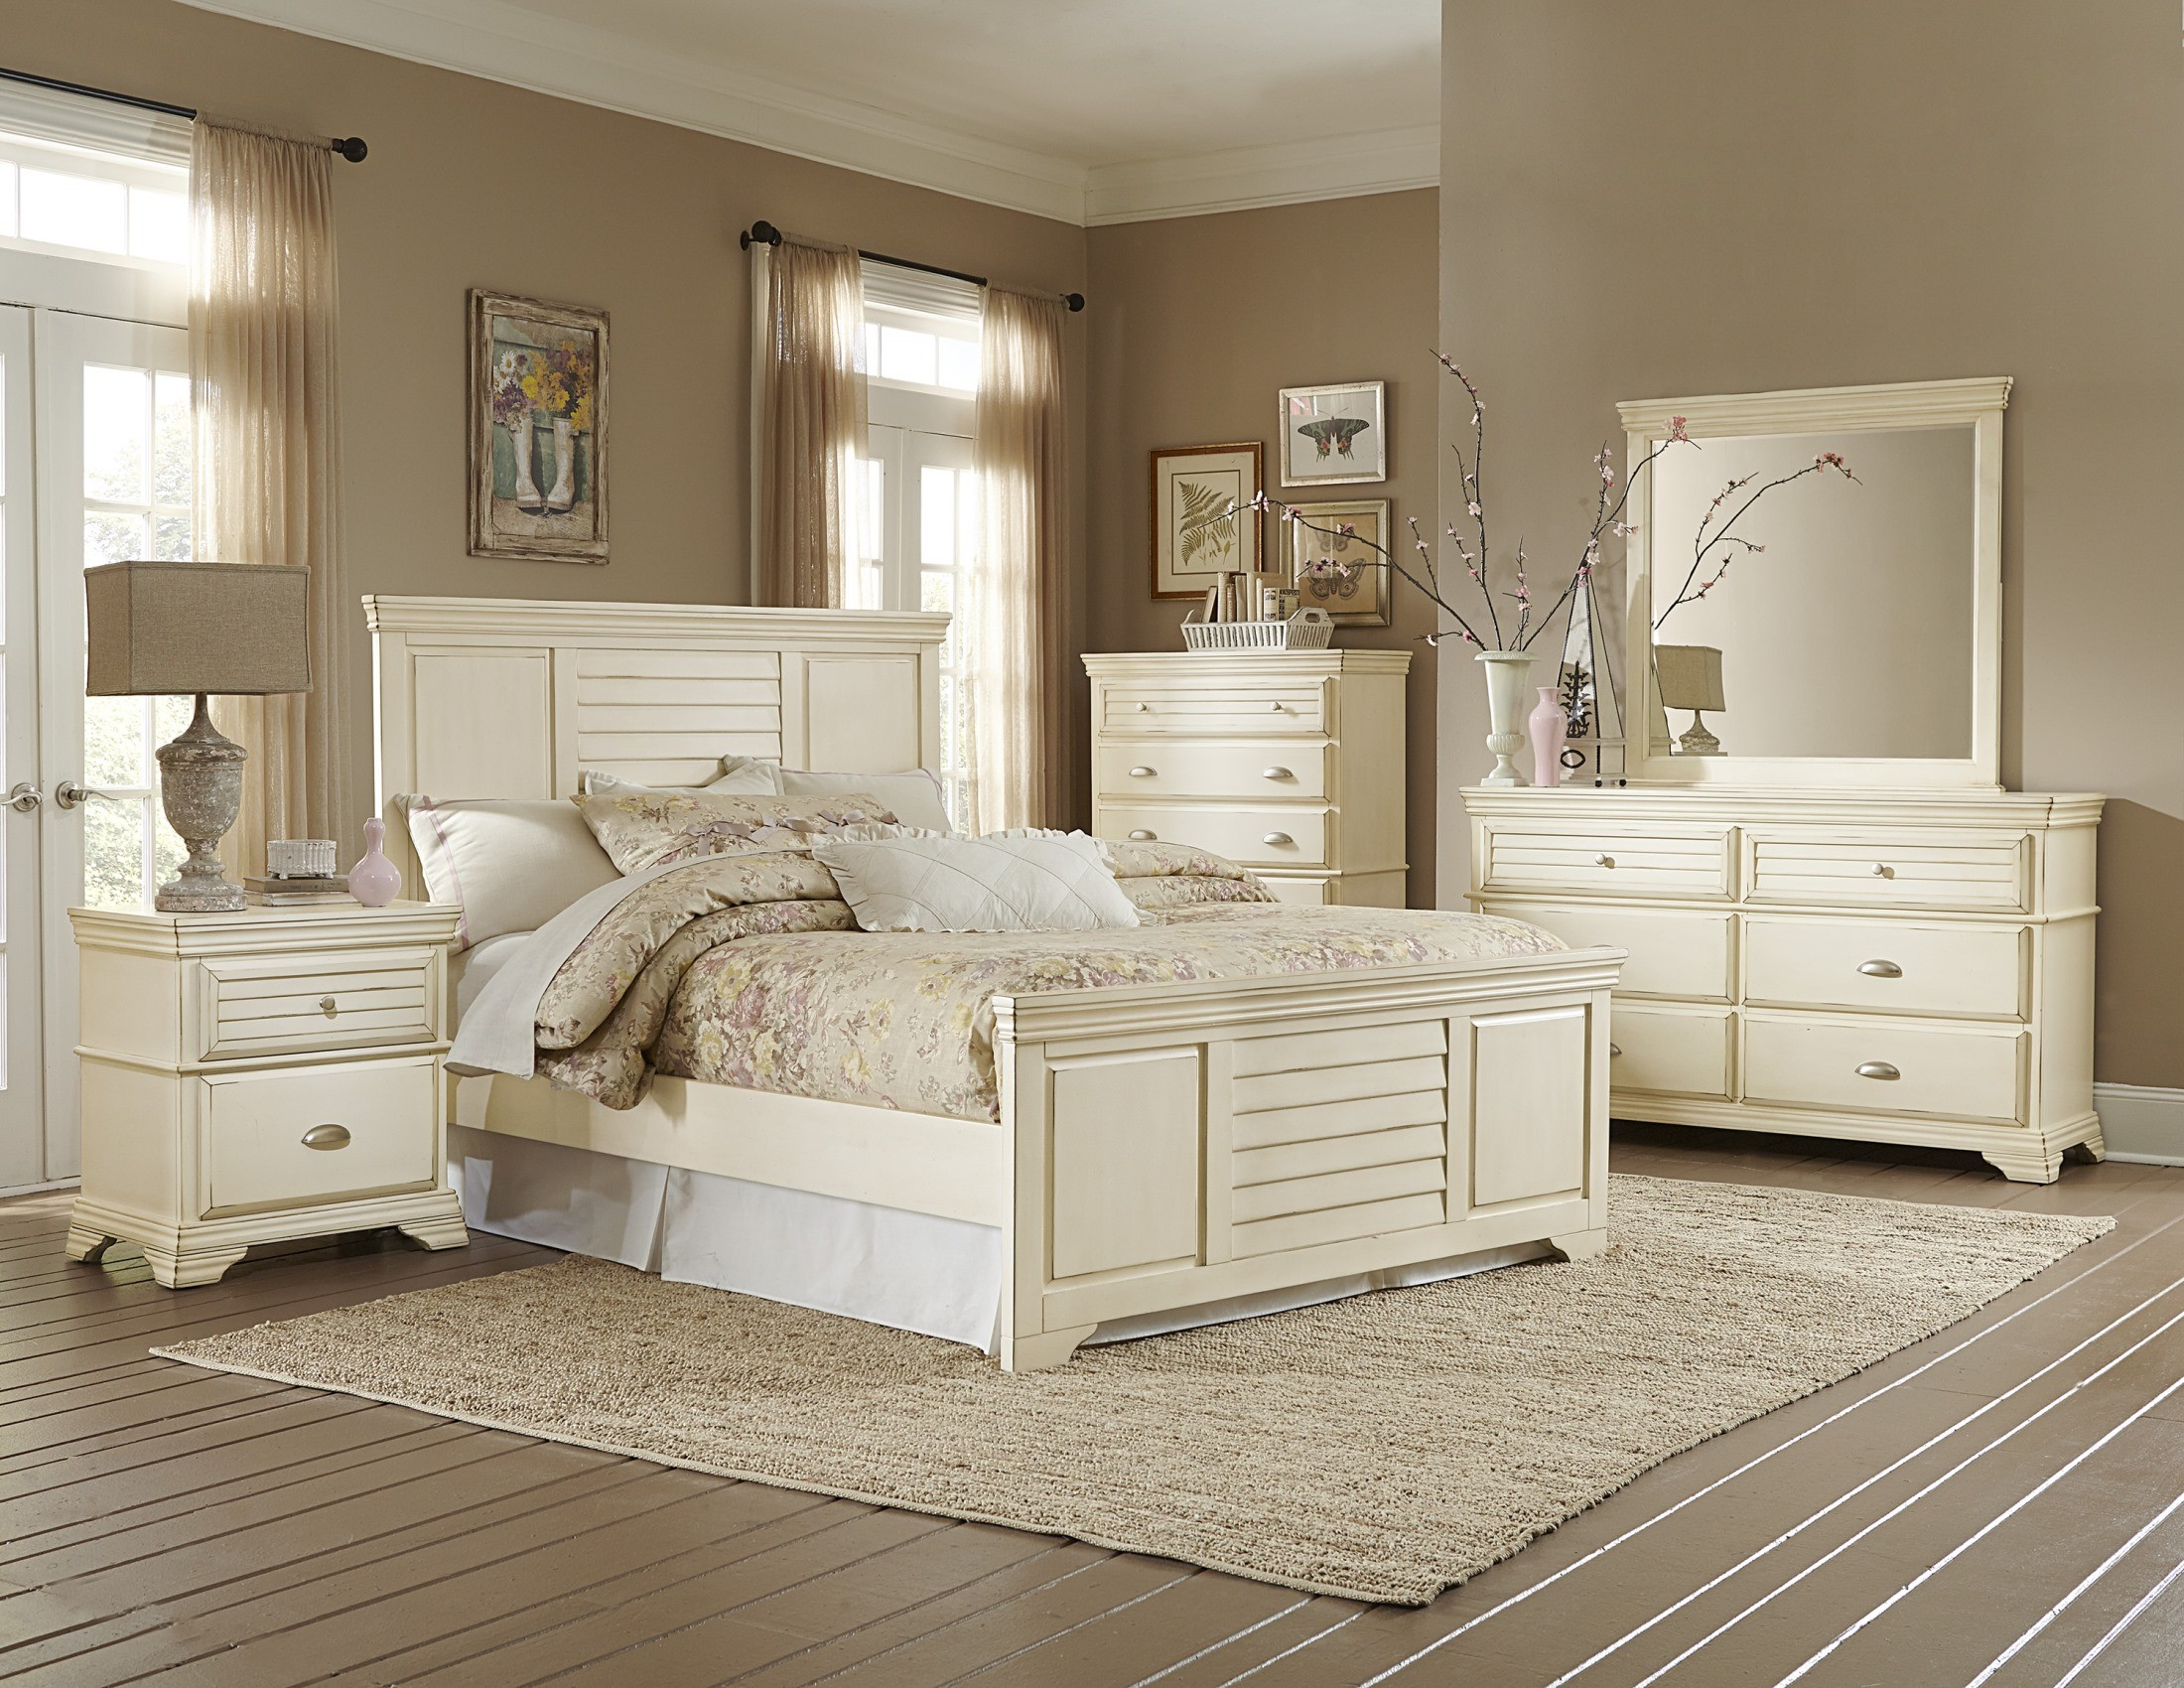 laurinda antique white panel bedroom set from homelegance